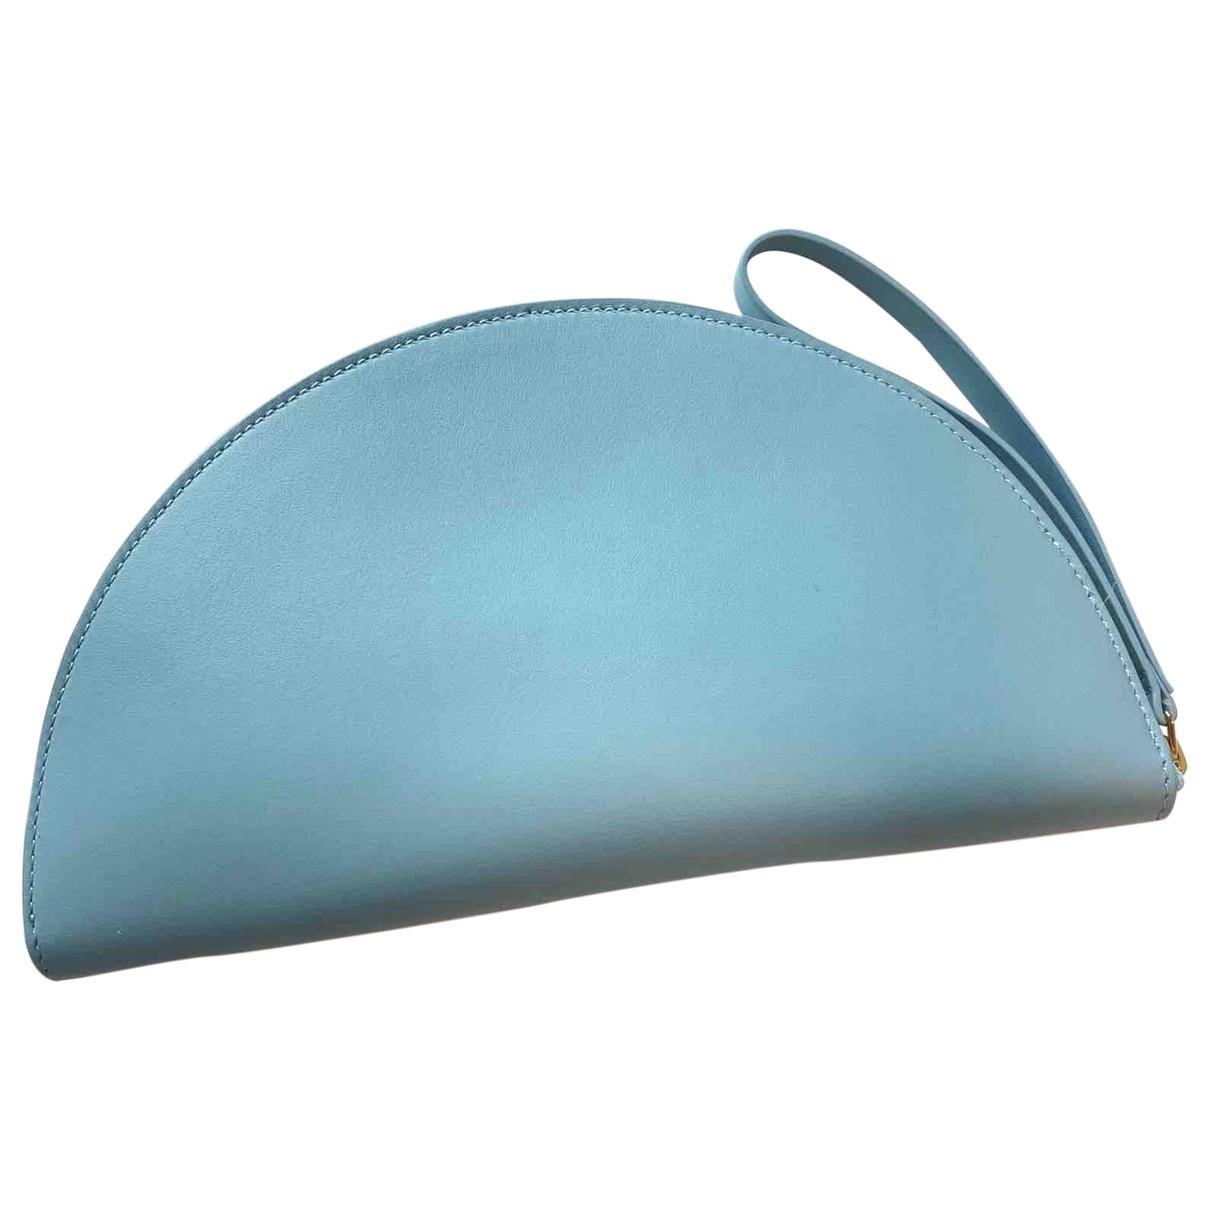 Mansur Gavriel \N Portemonnaie in  Blau Leder